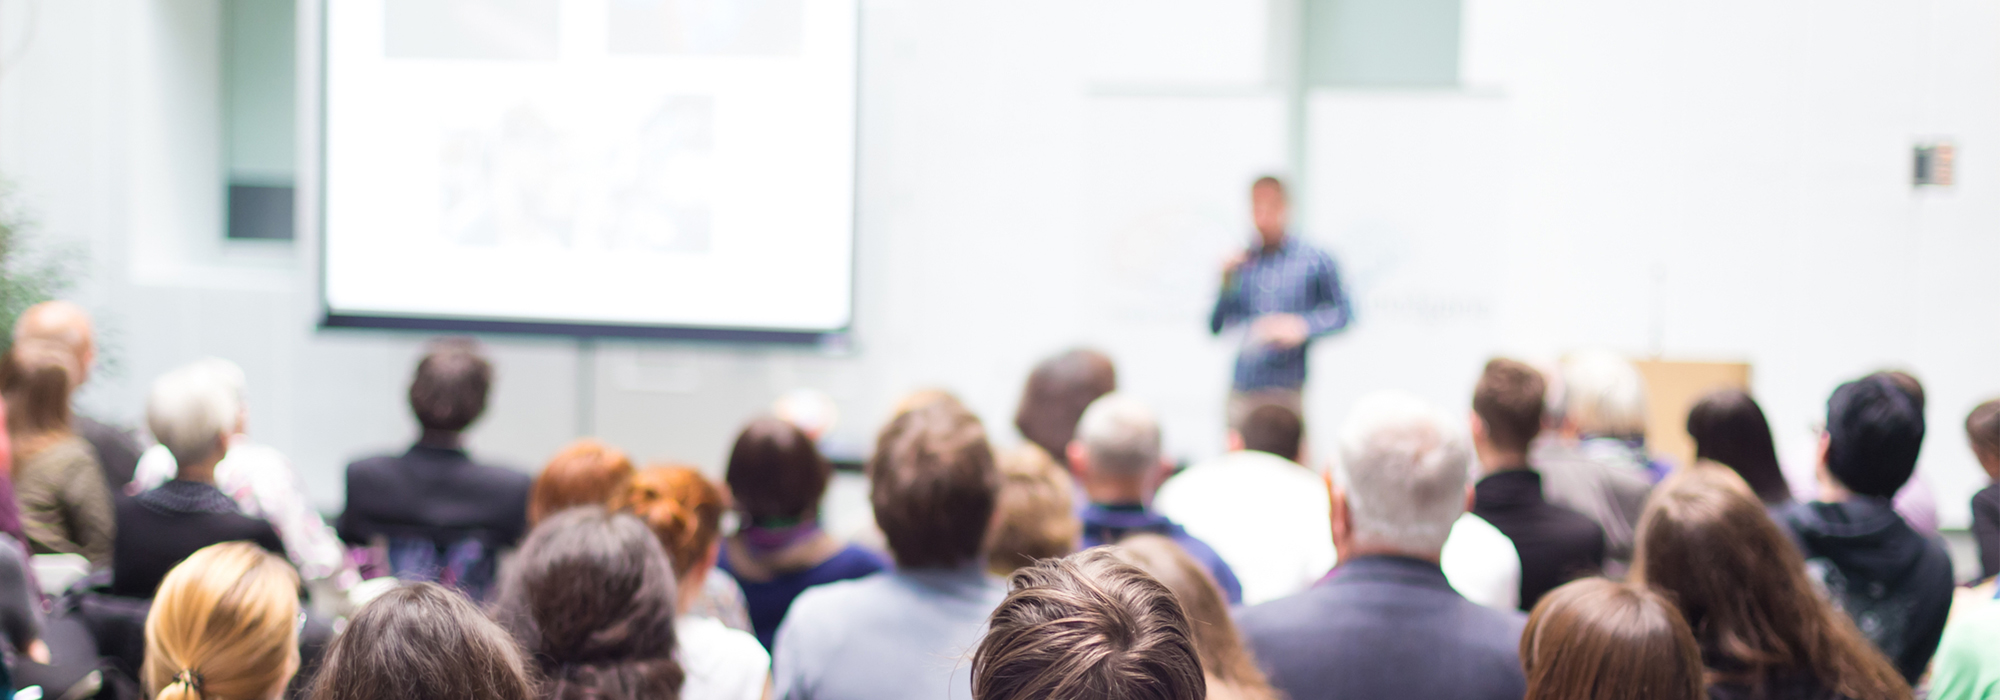 event-support-management-header